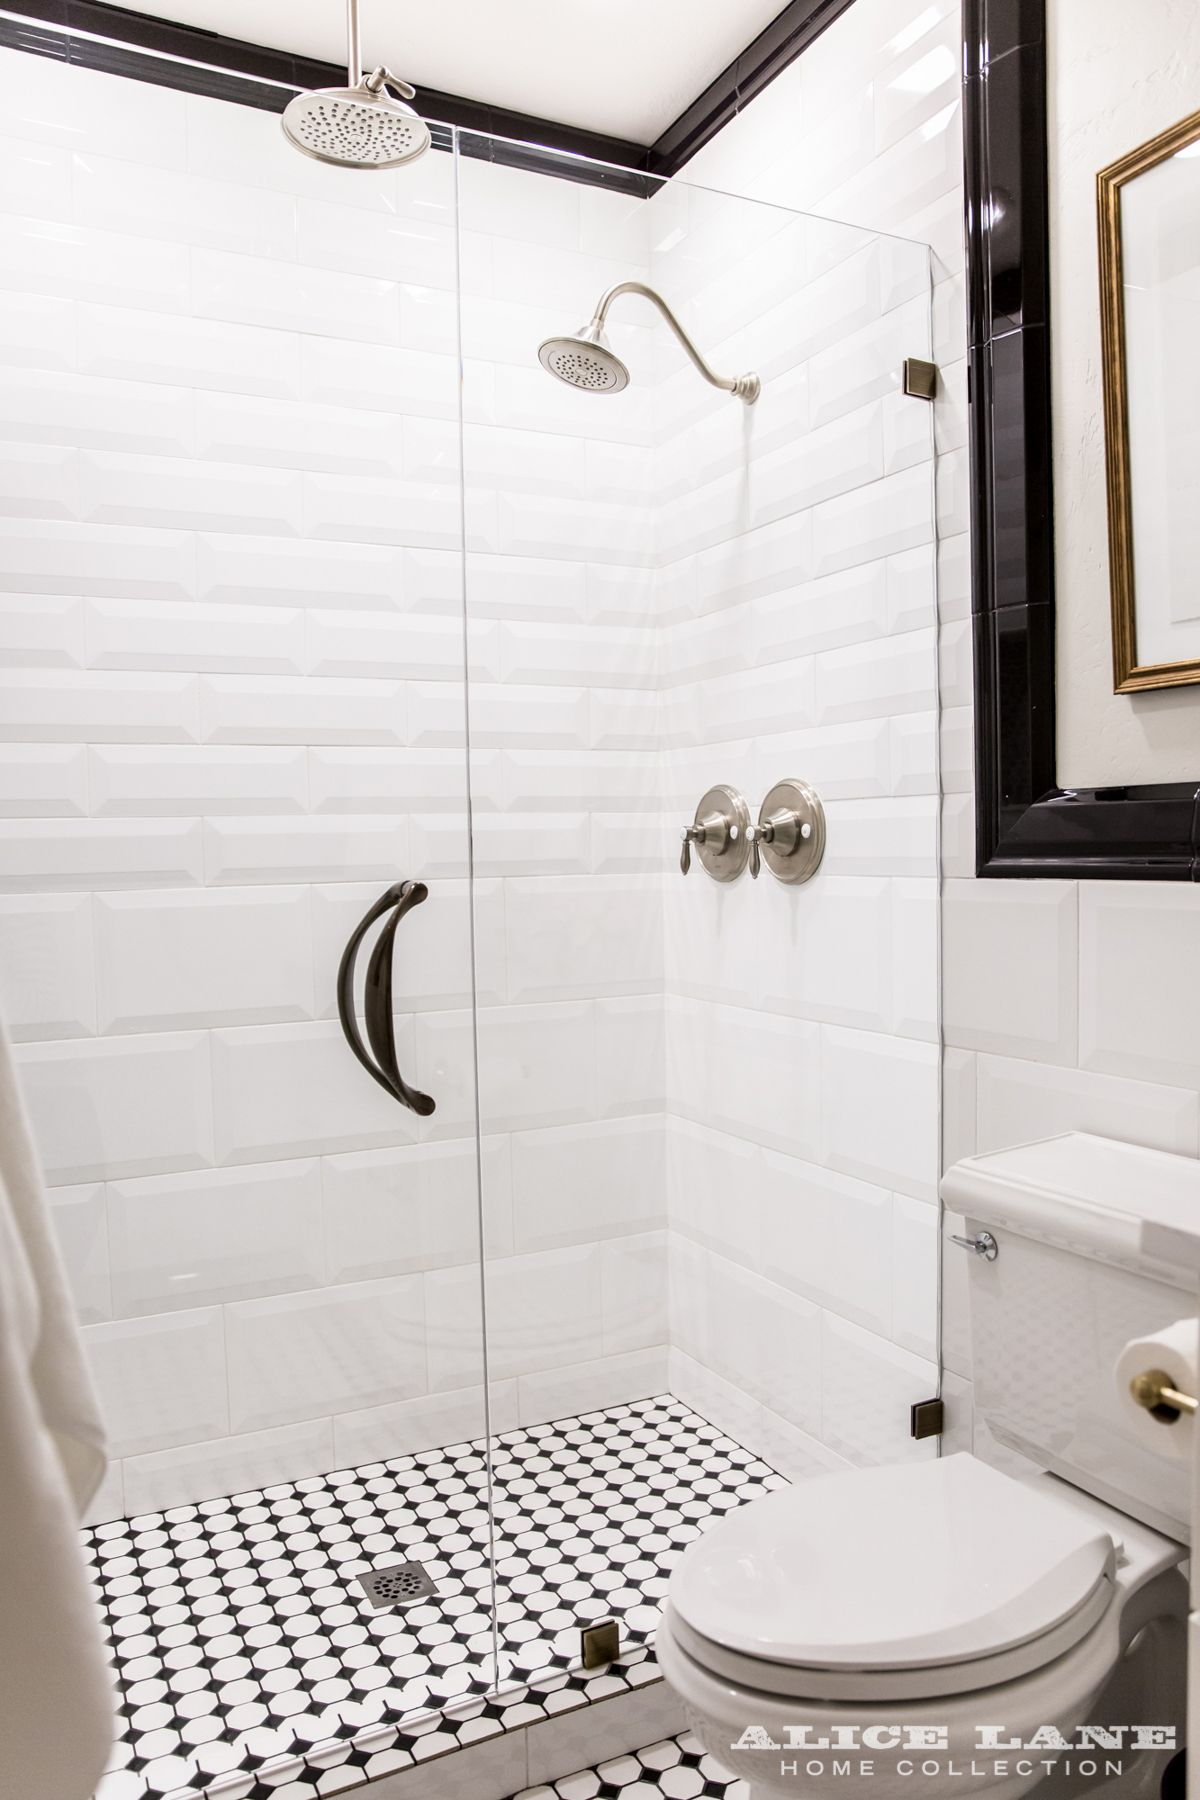 Show N\' Tell - Summer Hideaway | Bathroom Ideas for Me | Pinterest ...